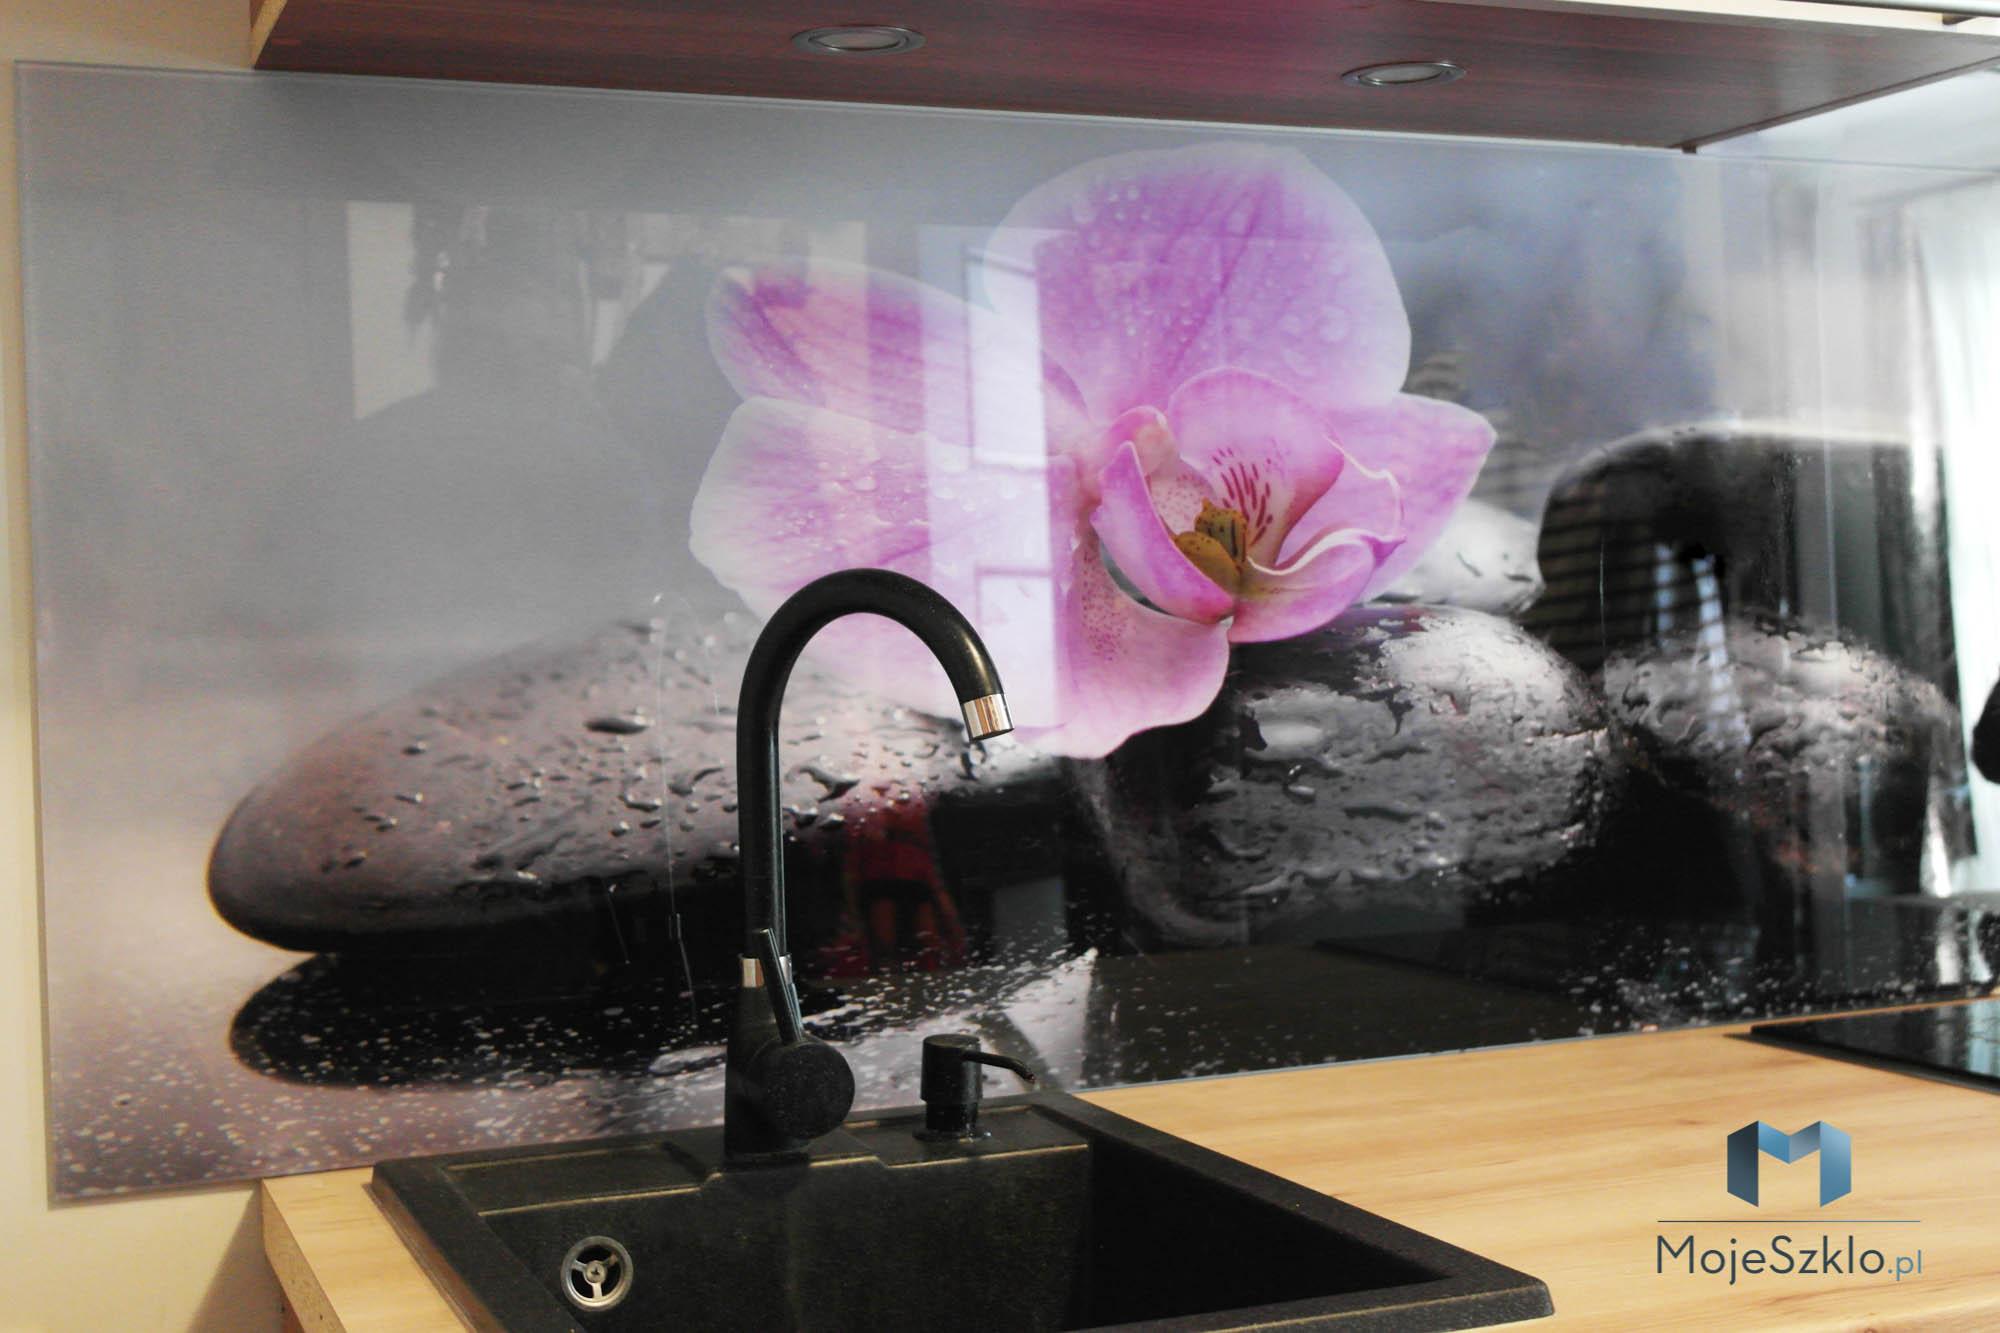 Szklo Do Kuchni Orchidea Krakow - Szklane panele kuchenne. Najlepsze wzory do kuchni